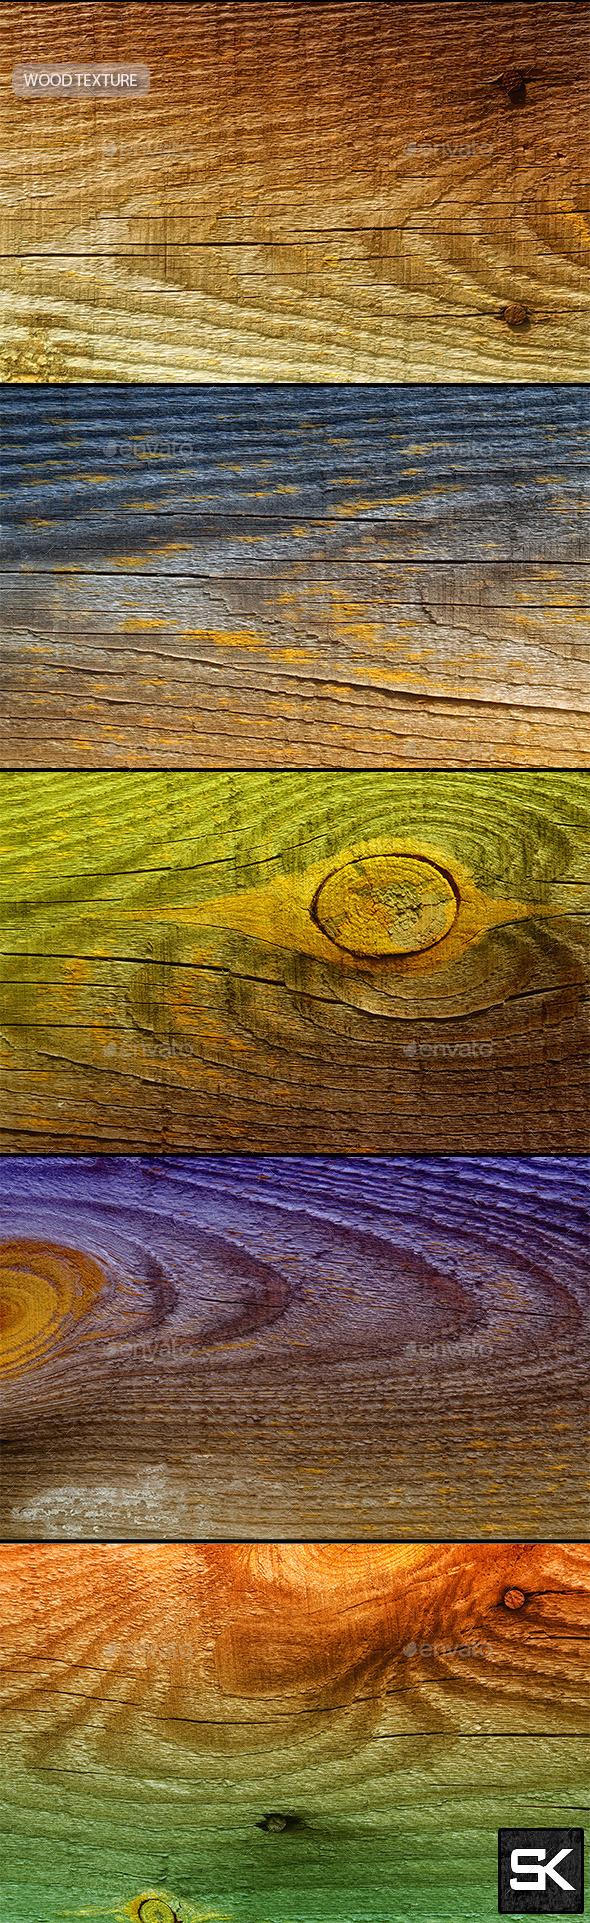 Wood Texture.2 - Wood Textures